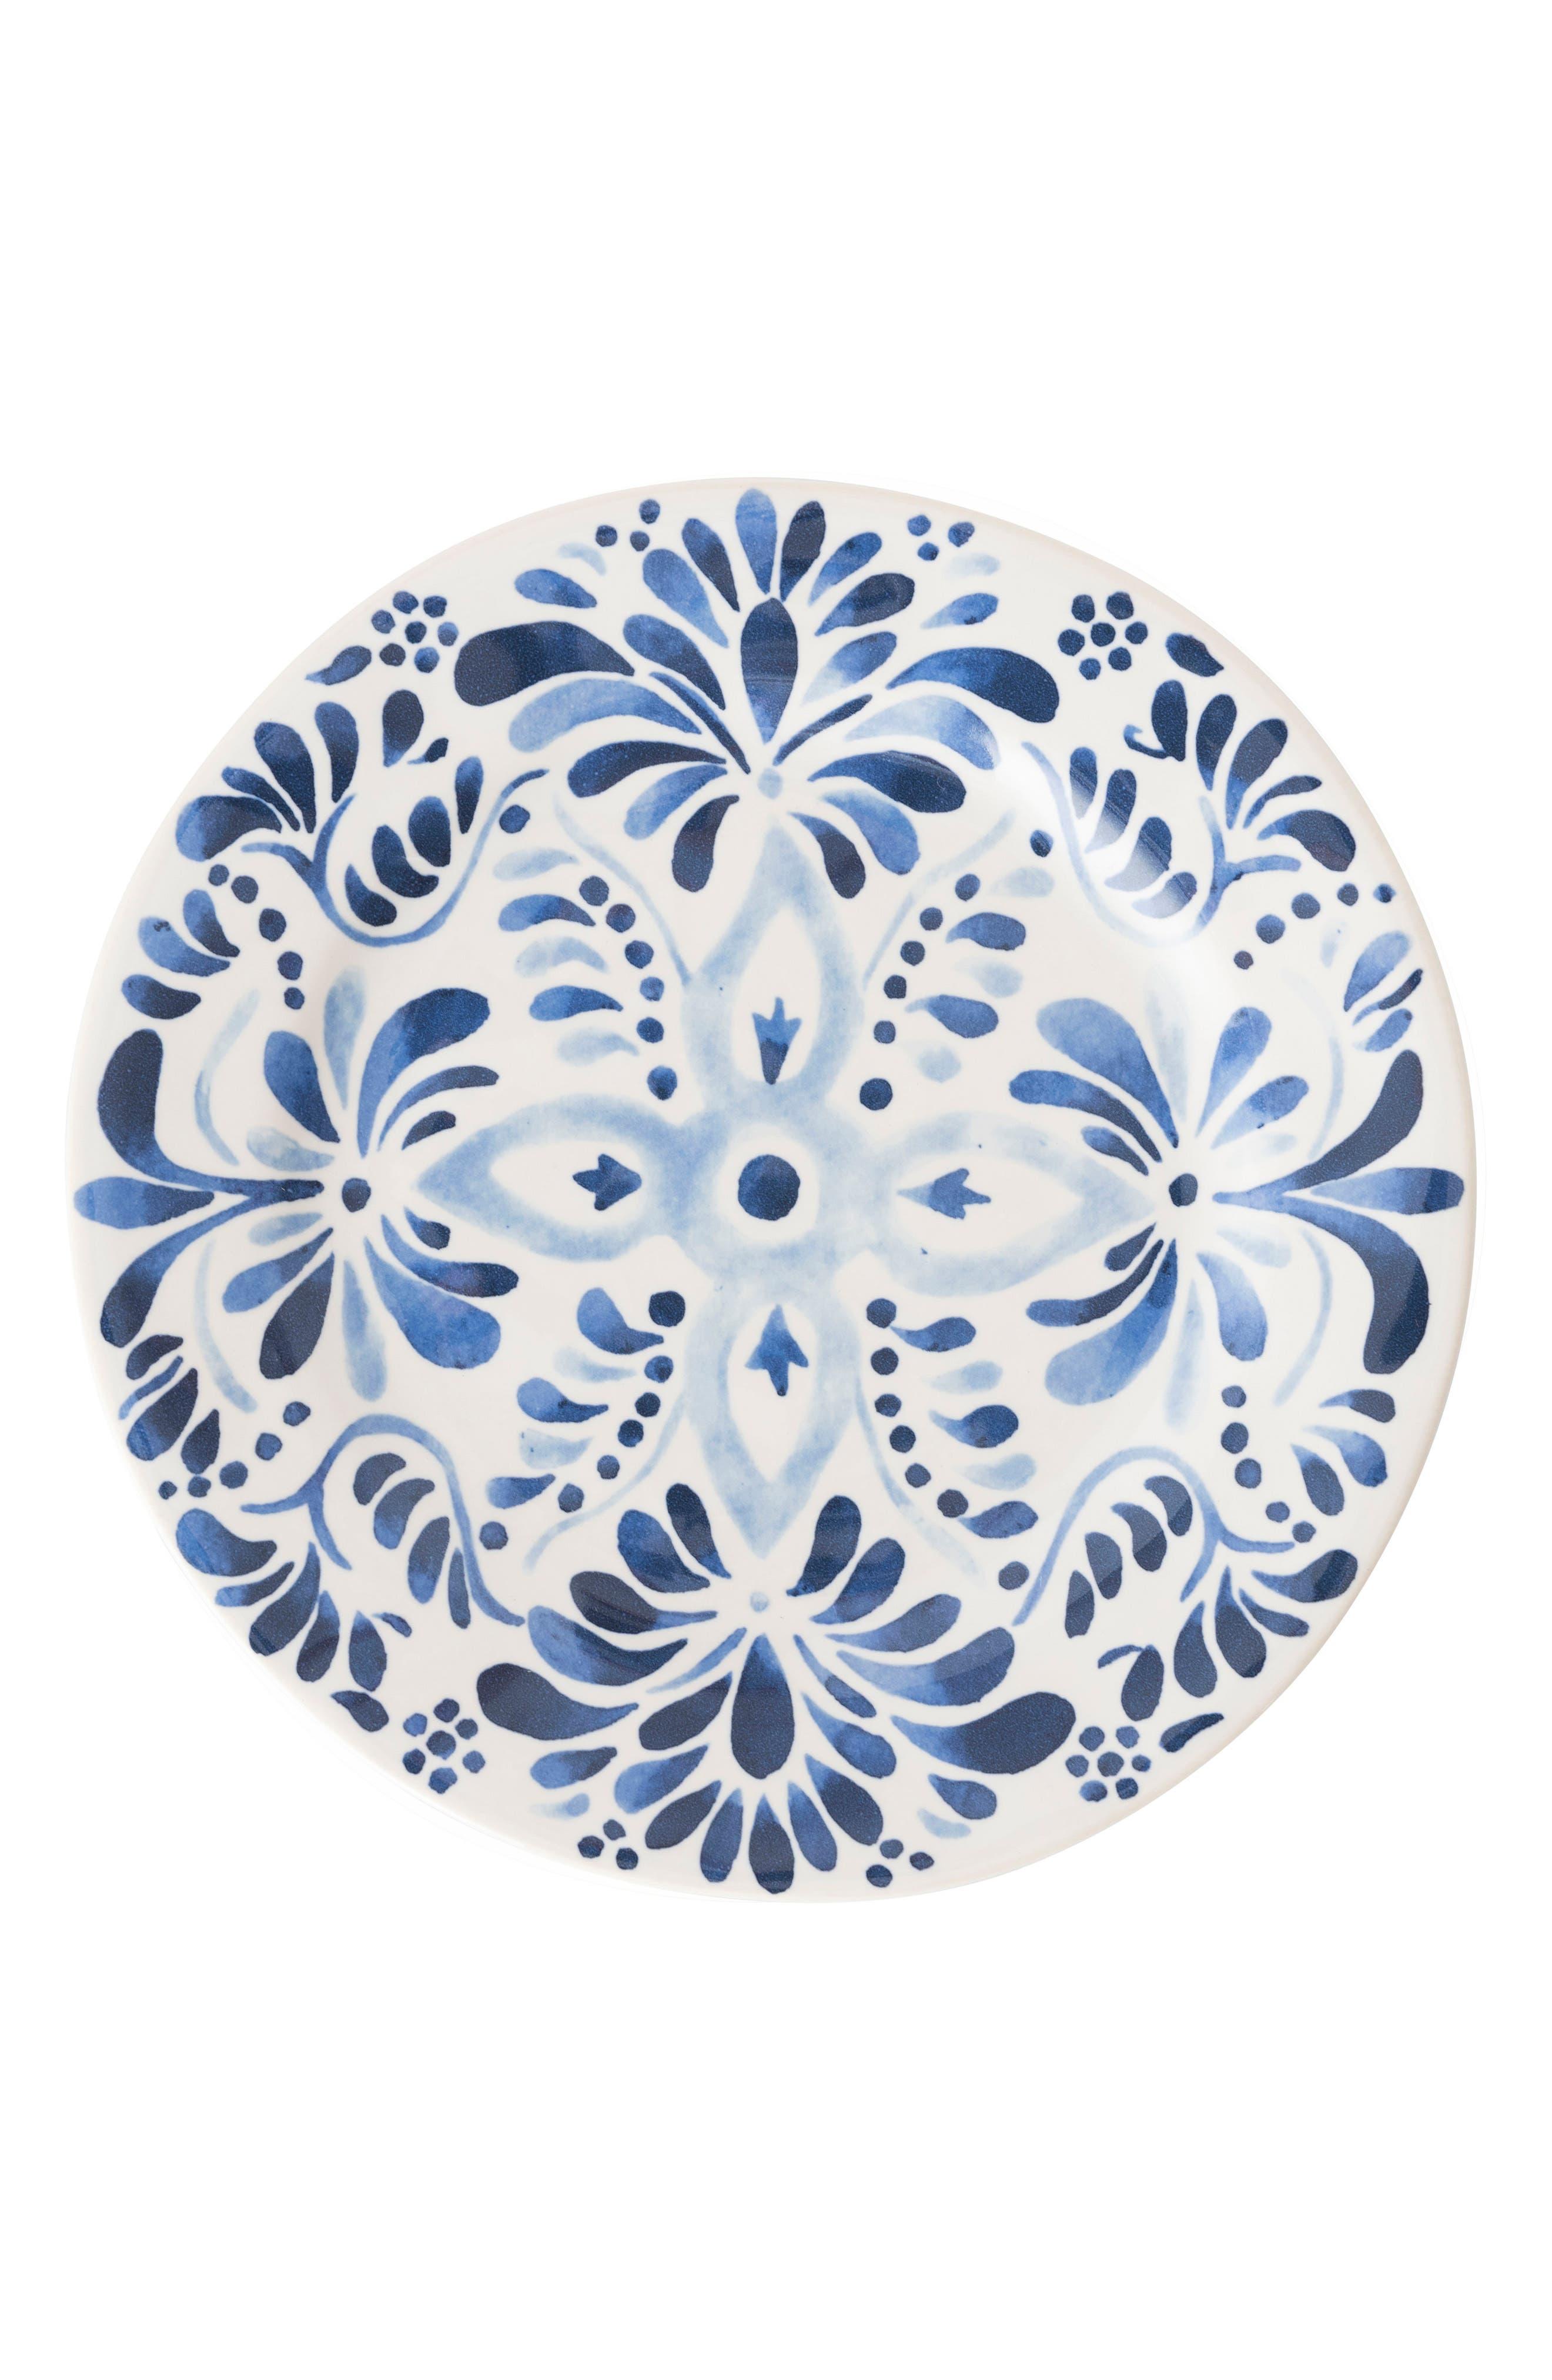 JULISKA Wanderlust Collection - Iberian Journey Ceramic Salad/Dessert Plate, Main, color, INDIGO